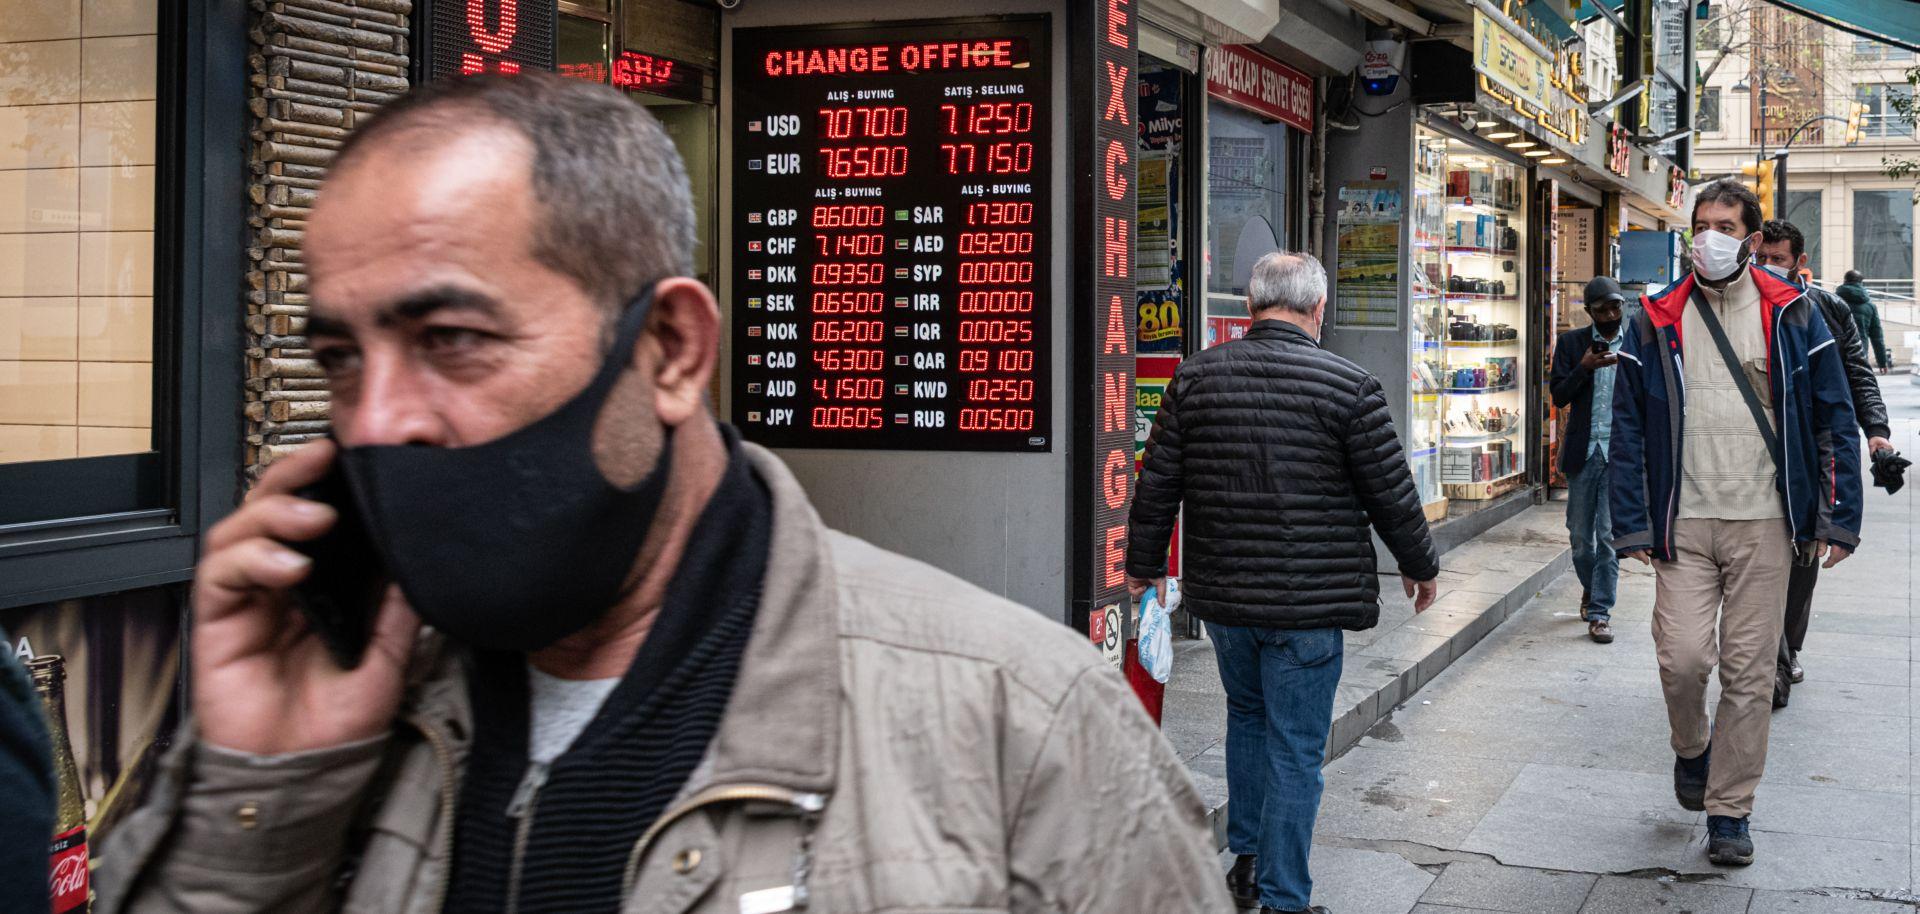 Pedestrians wearing masks walk down a street in Istanbul'sEminonu district on May 5, 2020.